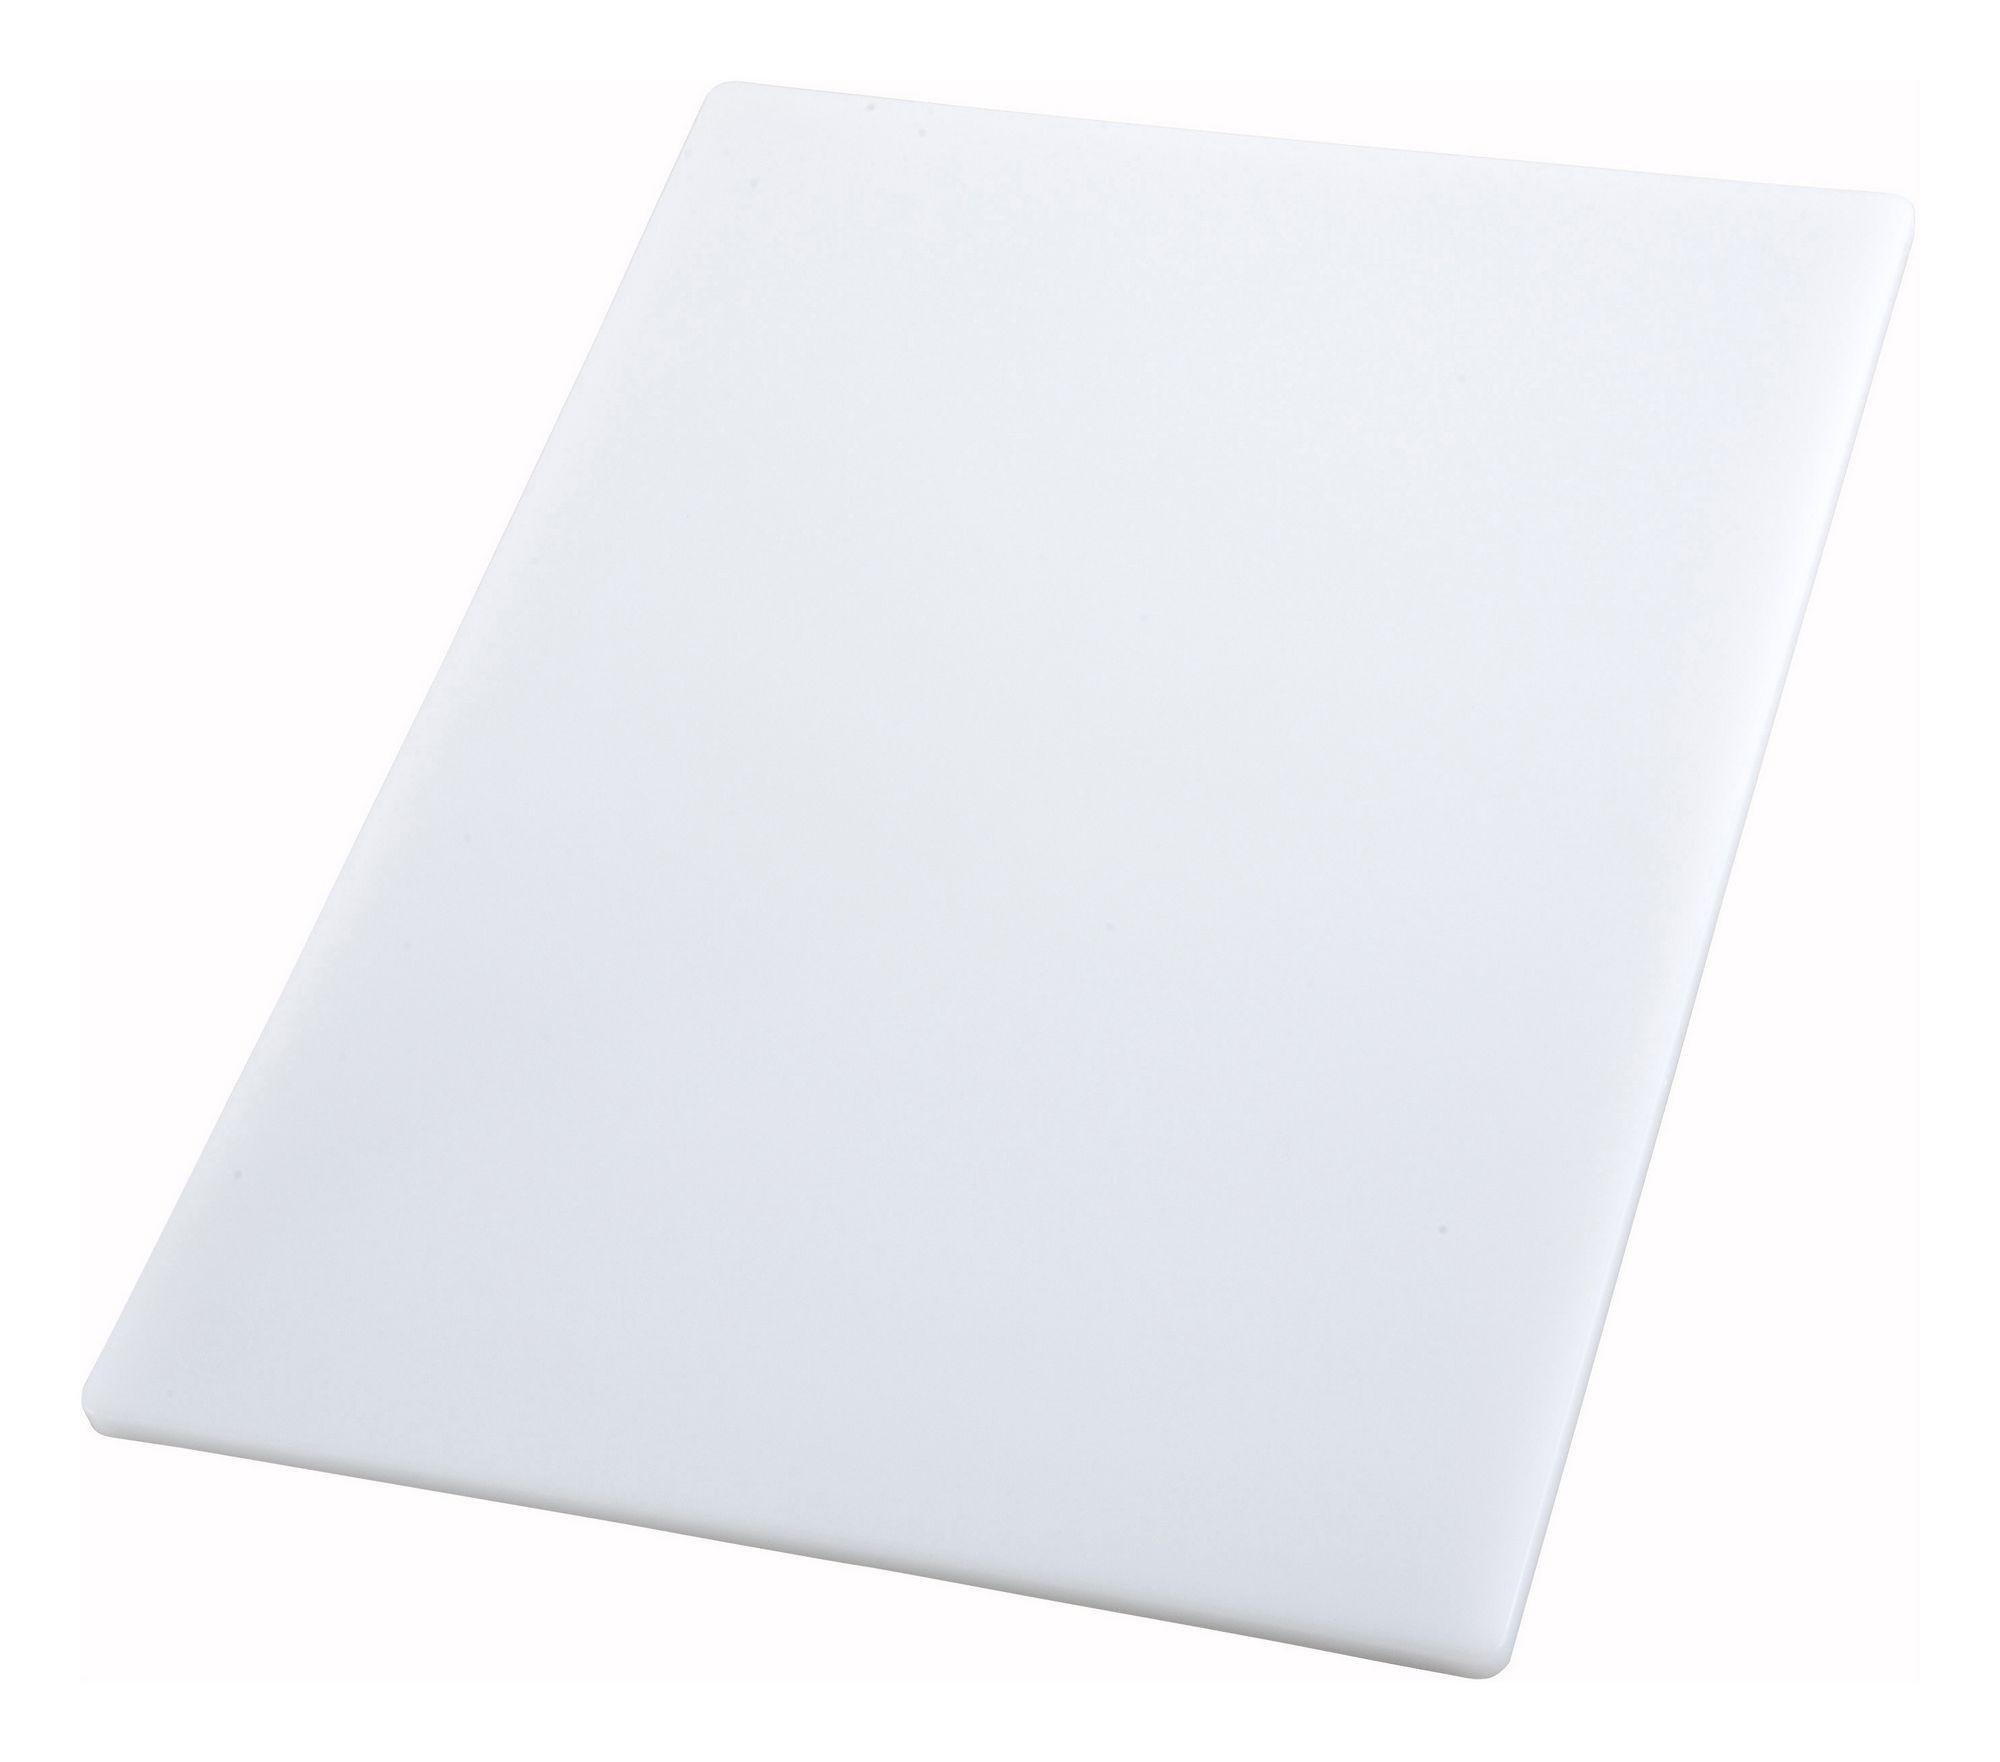 "Winco CBWT-1830 White Cutting Board 18"" x 30"" x 1/2"""